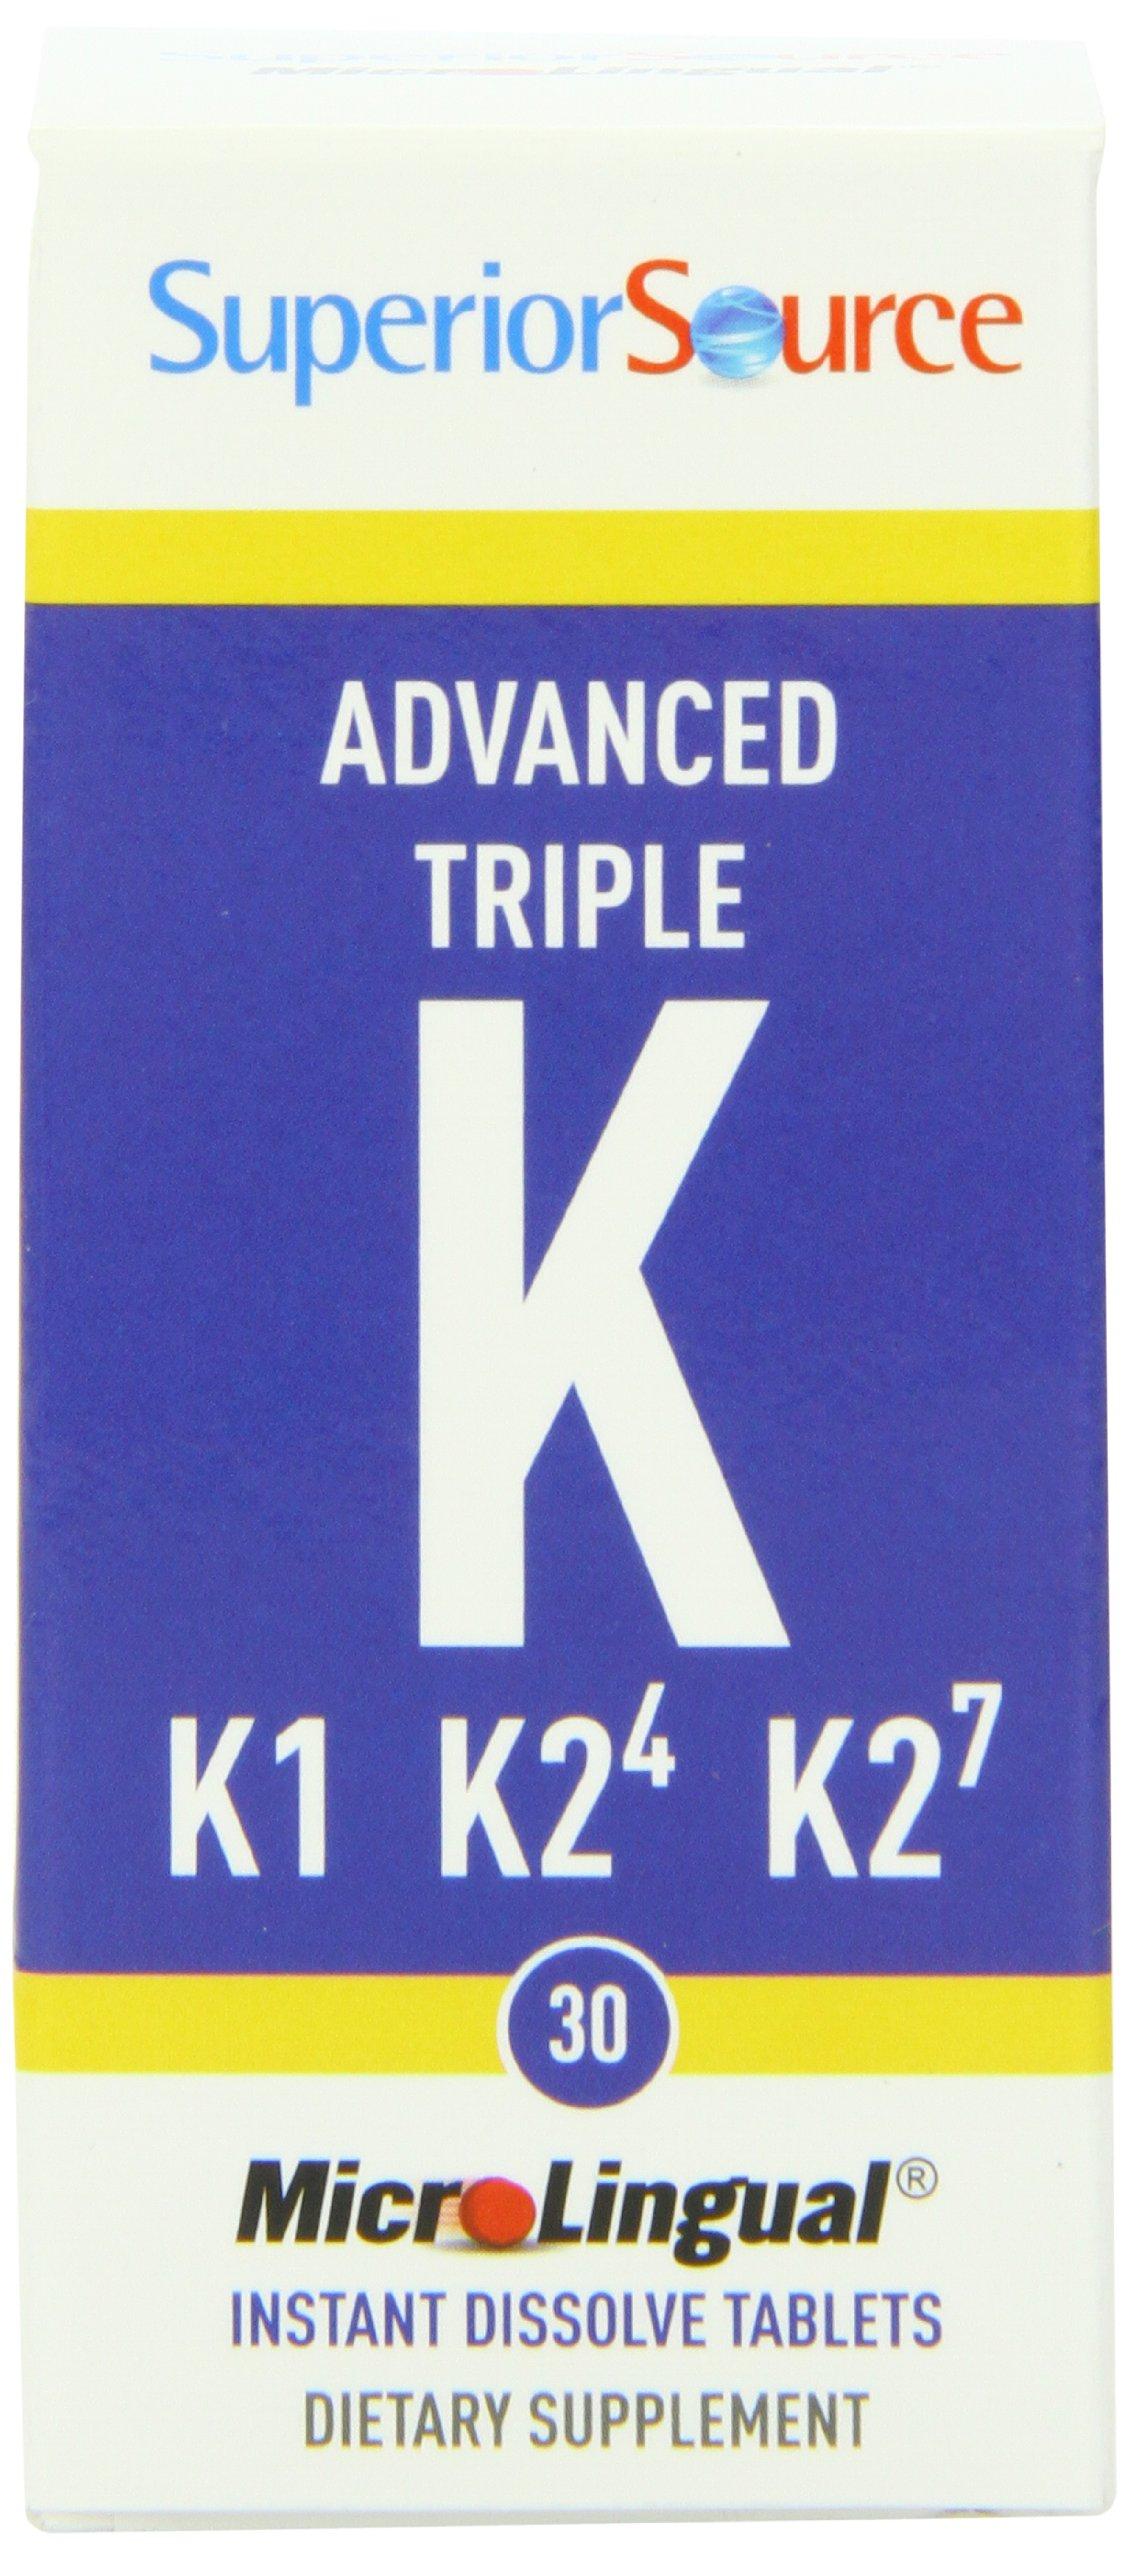 Superior Source Vitamin K1 K2 MK-4 MK-7 Sublingual - Menaquinone 4 500 mcg, Menaquinone 7 50 mcg Instant Dissolve Tablets - Dissolvable K2 Vitamins - 30 Count